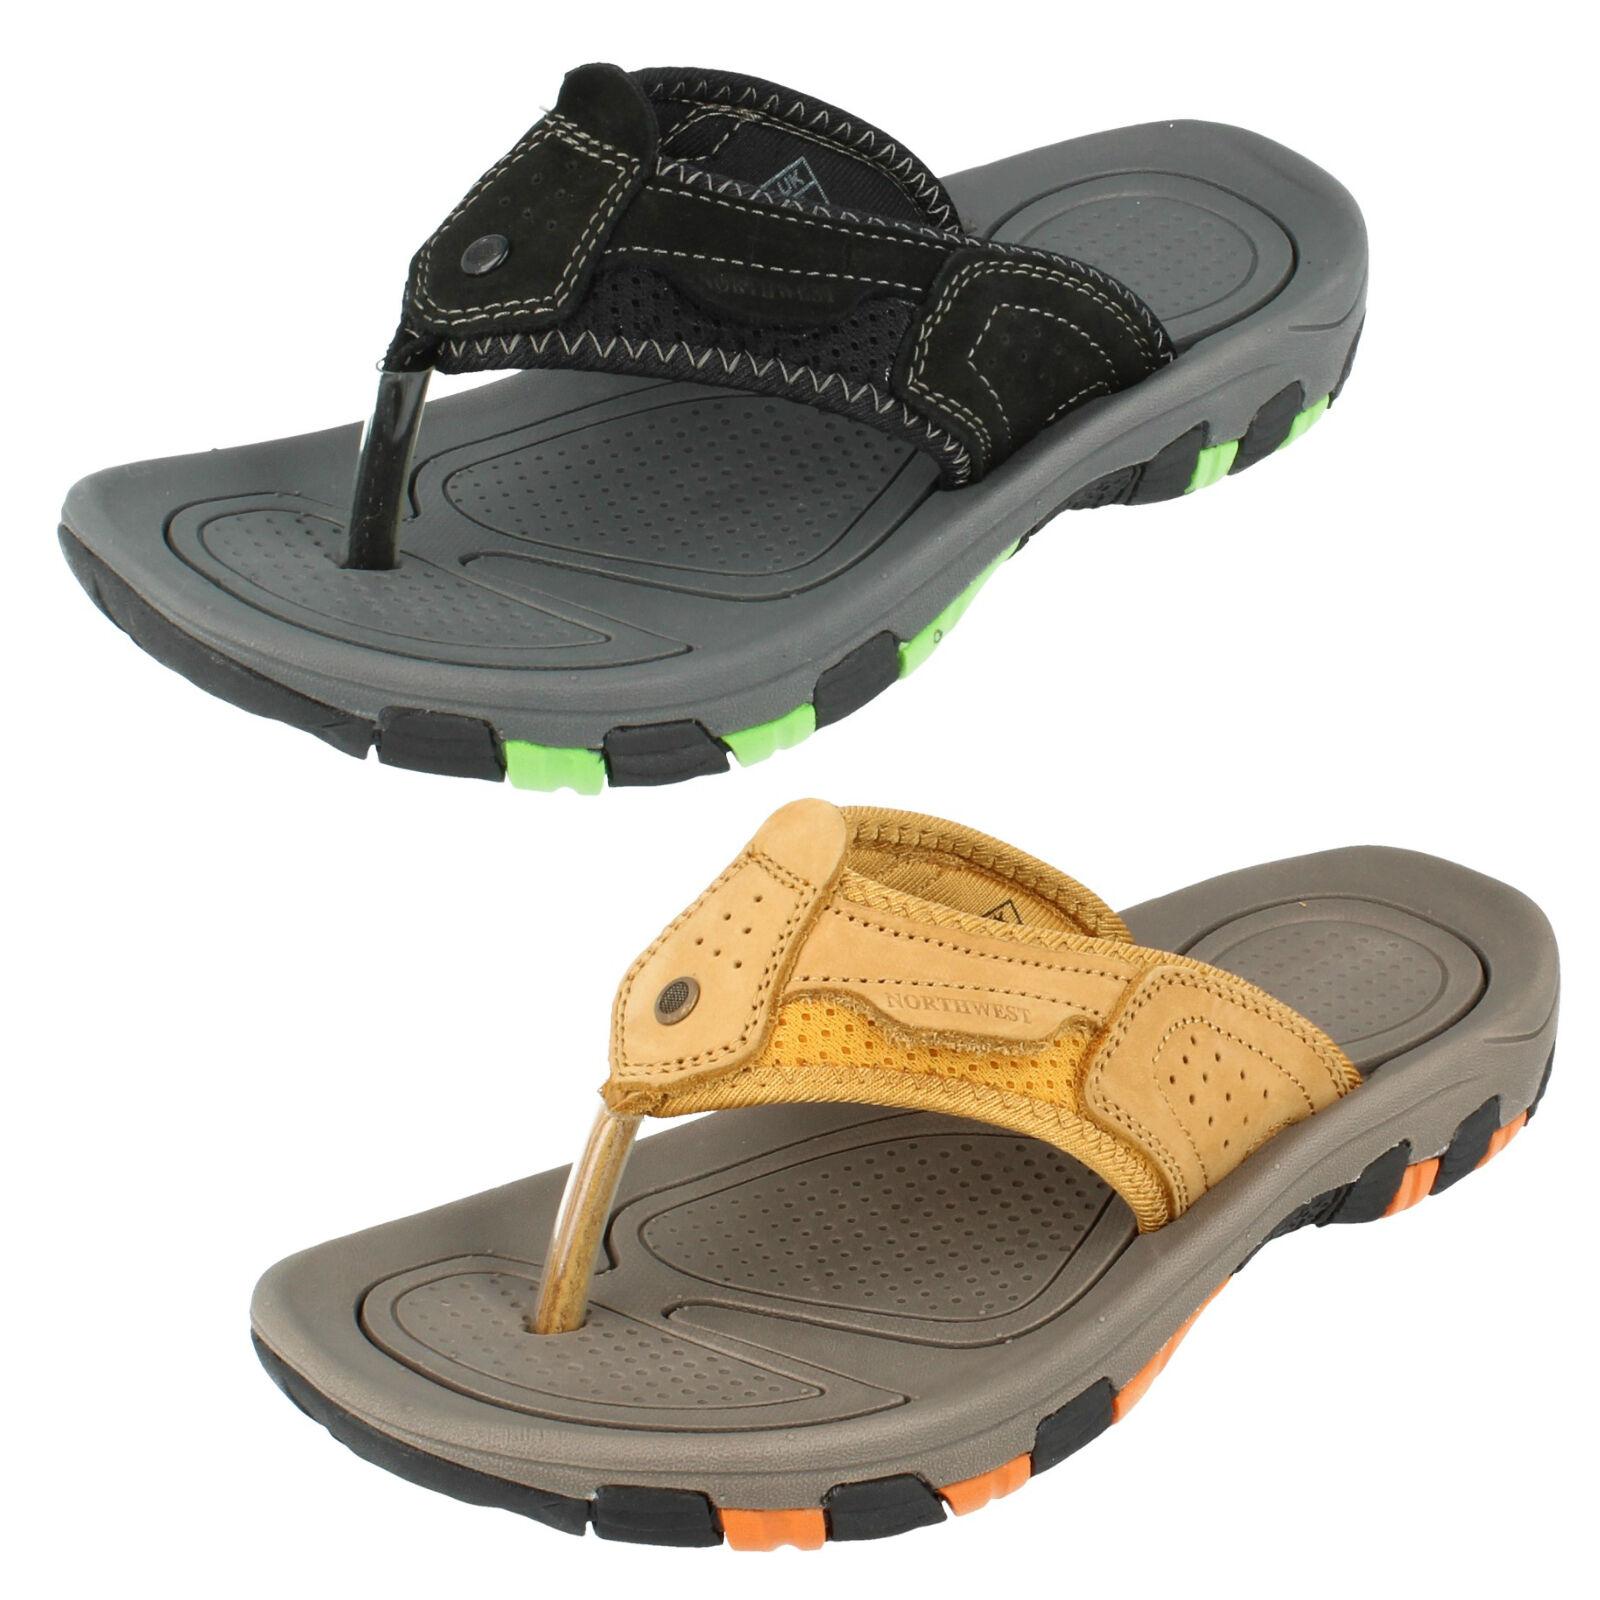 Uomo FIJI pelle sandali infradito da Northwest